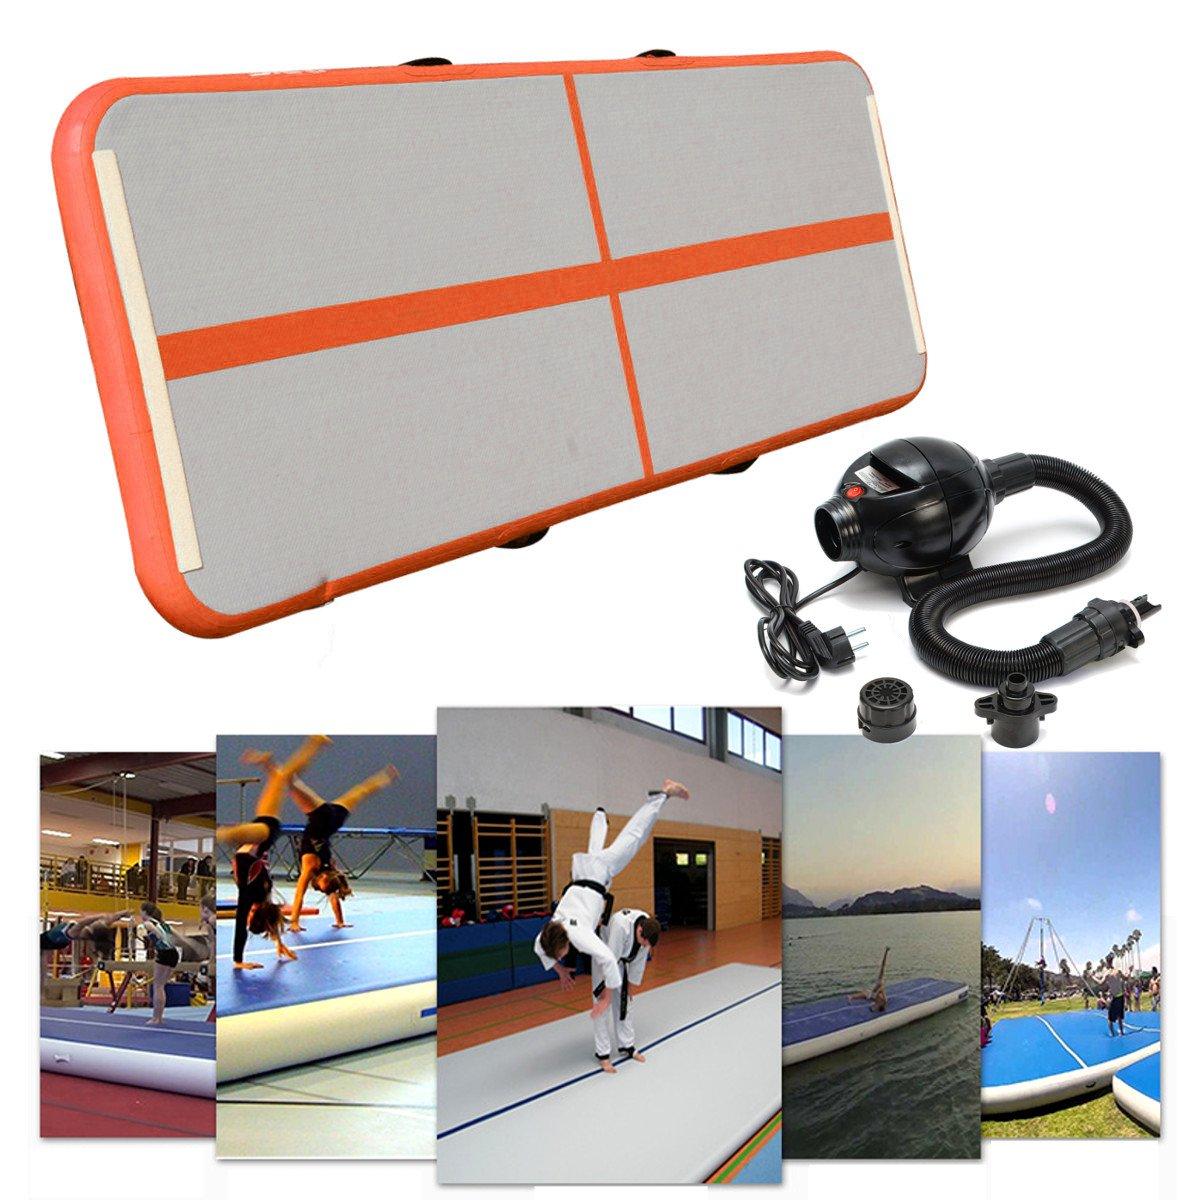 300*90*10cm Inflatable Air GYM Tumbling Track Floor Home Gymnastics Training Mat free shipping 6 2m inflatable gym air track inflatable air track gymnastics